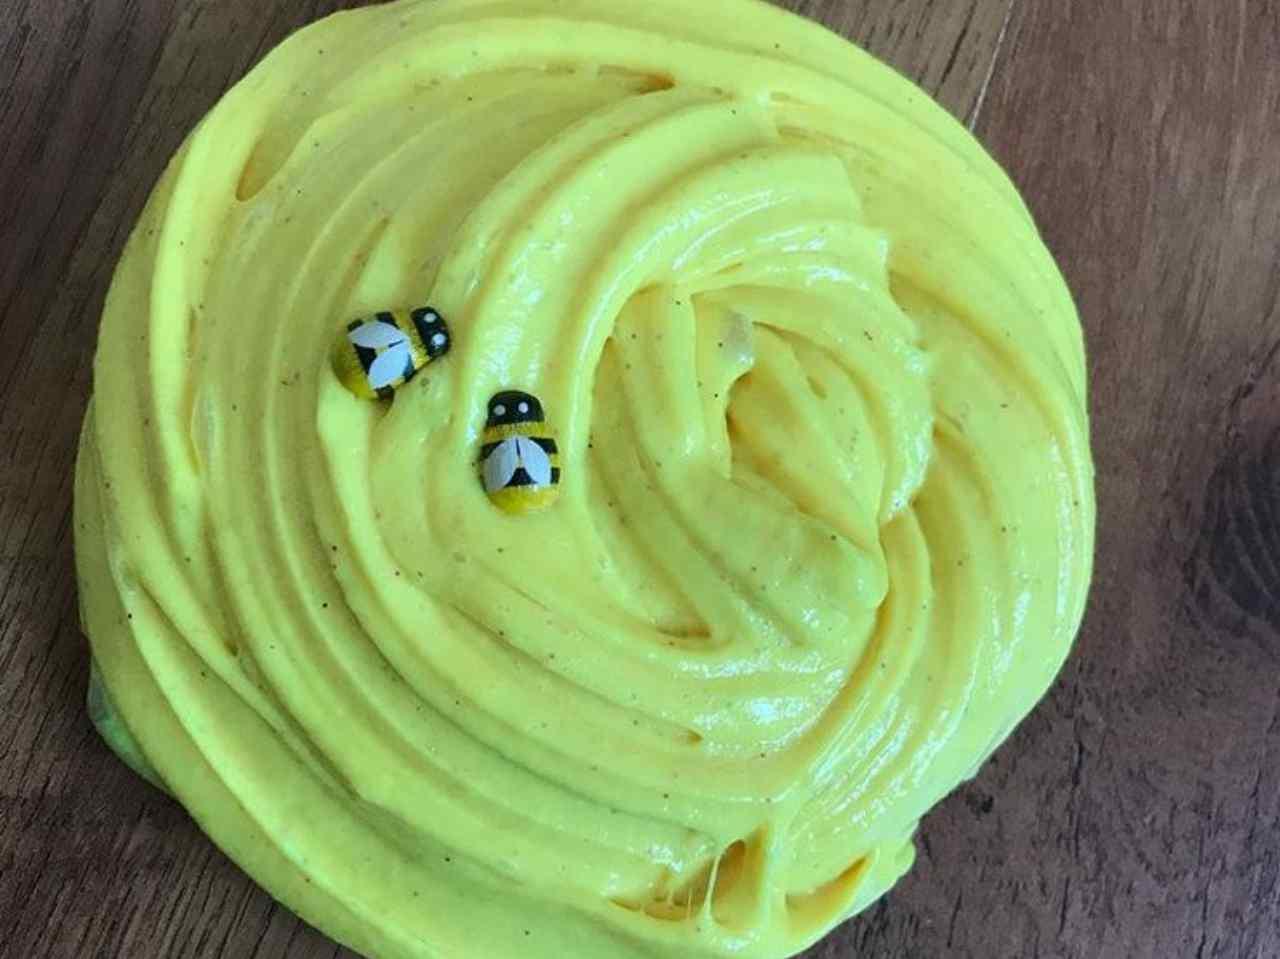 Slime giallo (fonte Instagram @xxslime_artistsxx)